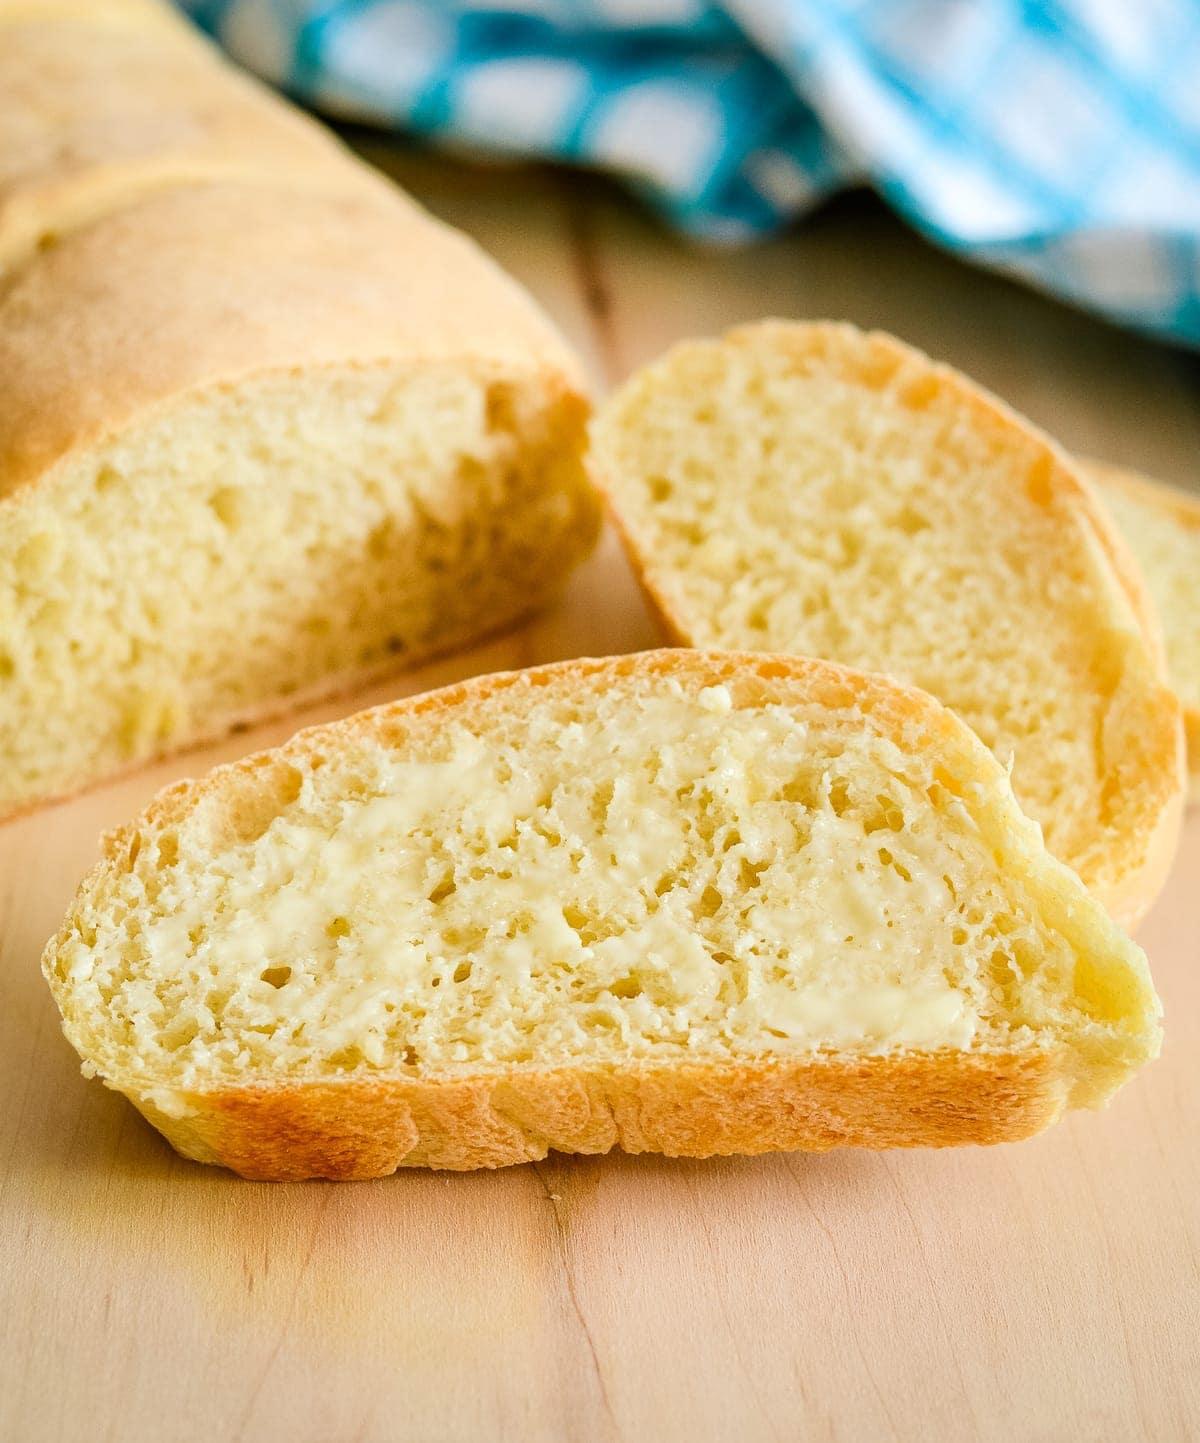 slices of italian crusty bread